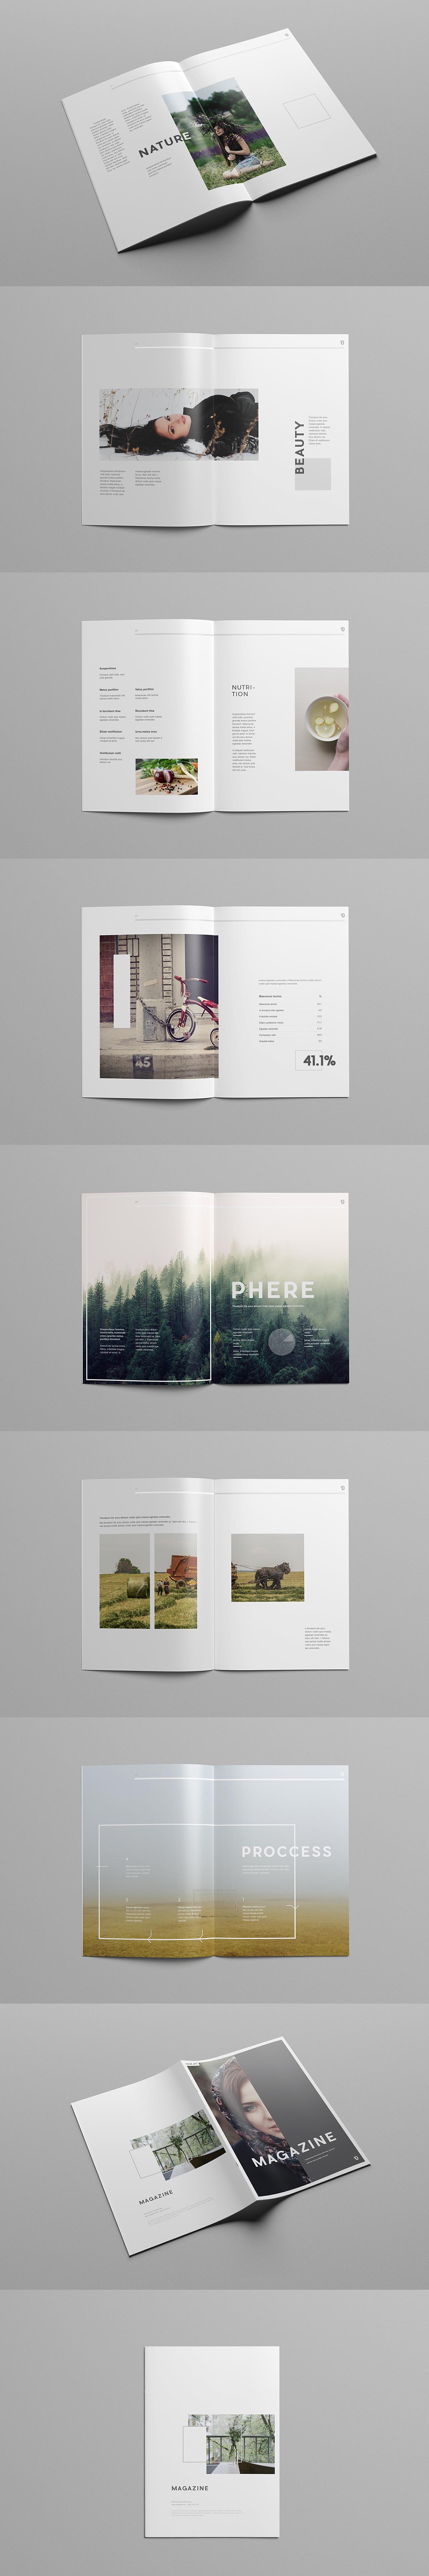 Magazine Template on Behance